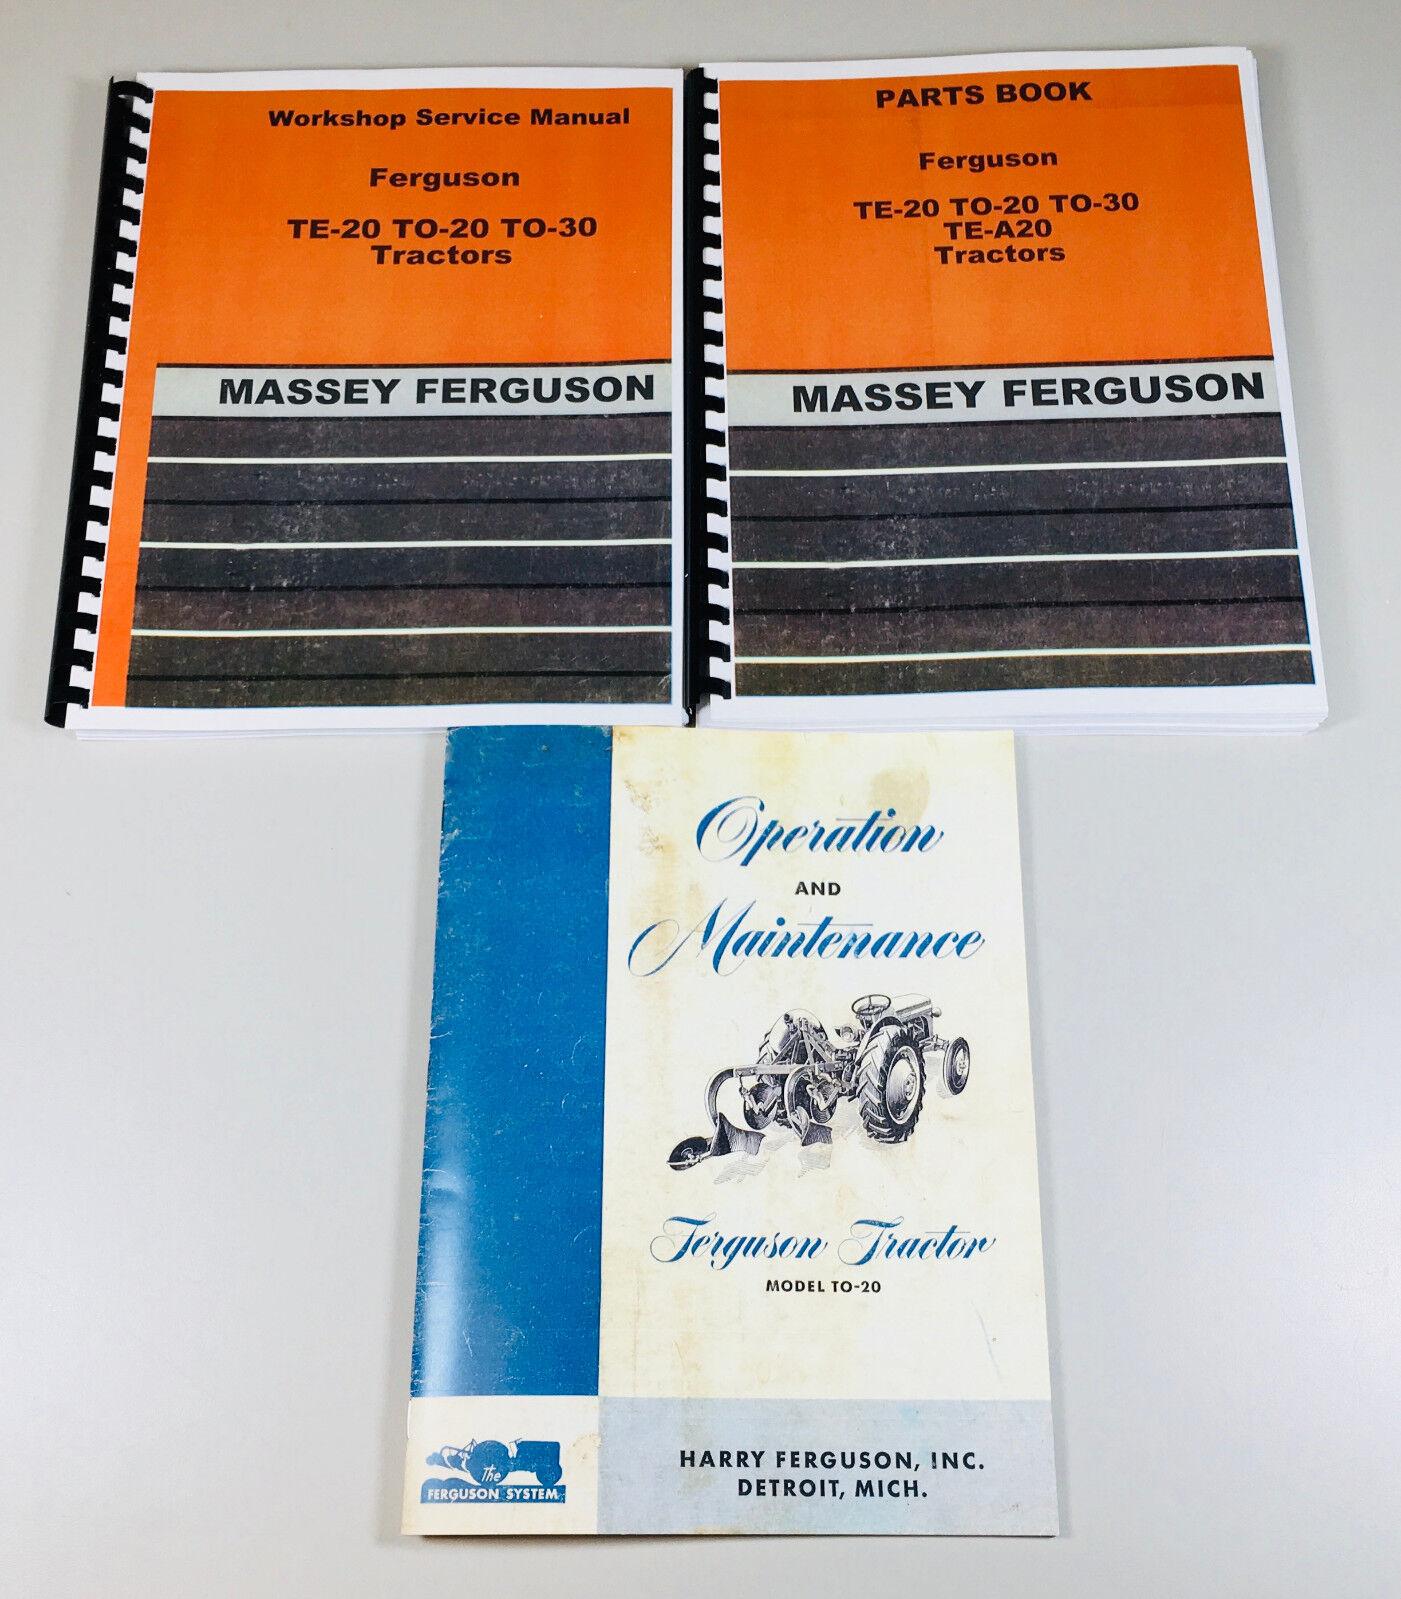 Complete Service, Parts and Operators Manuals